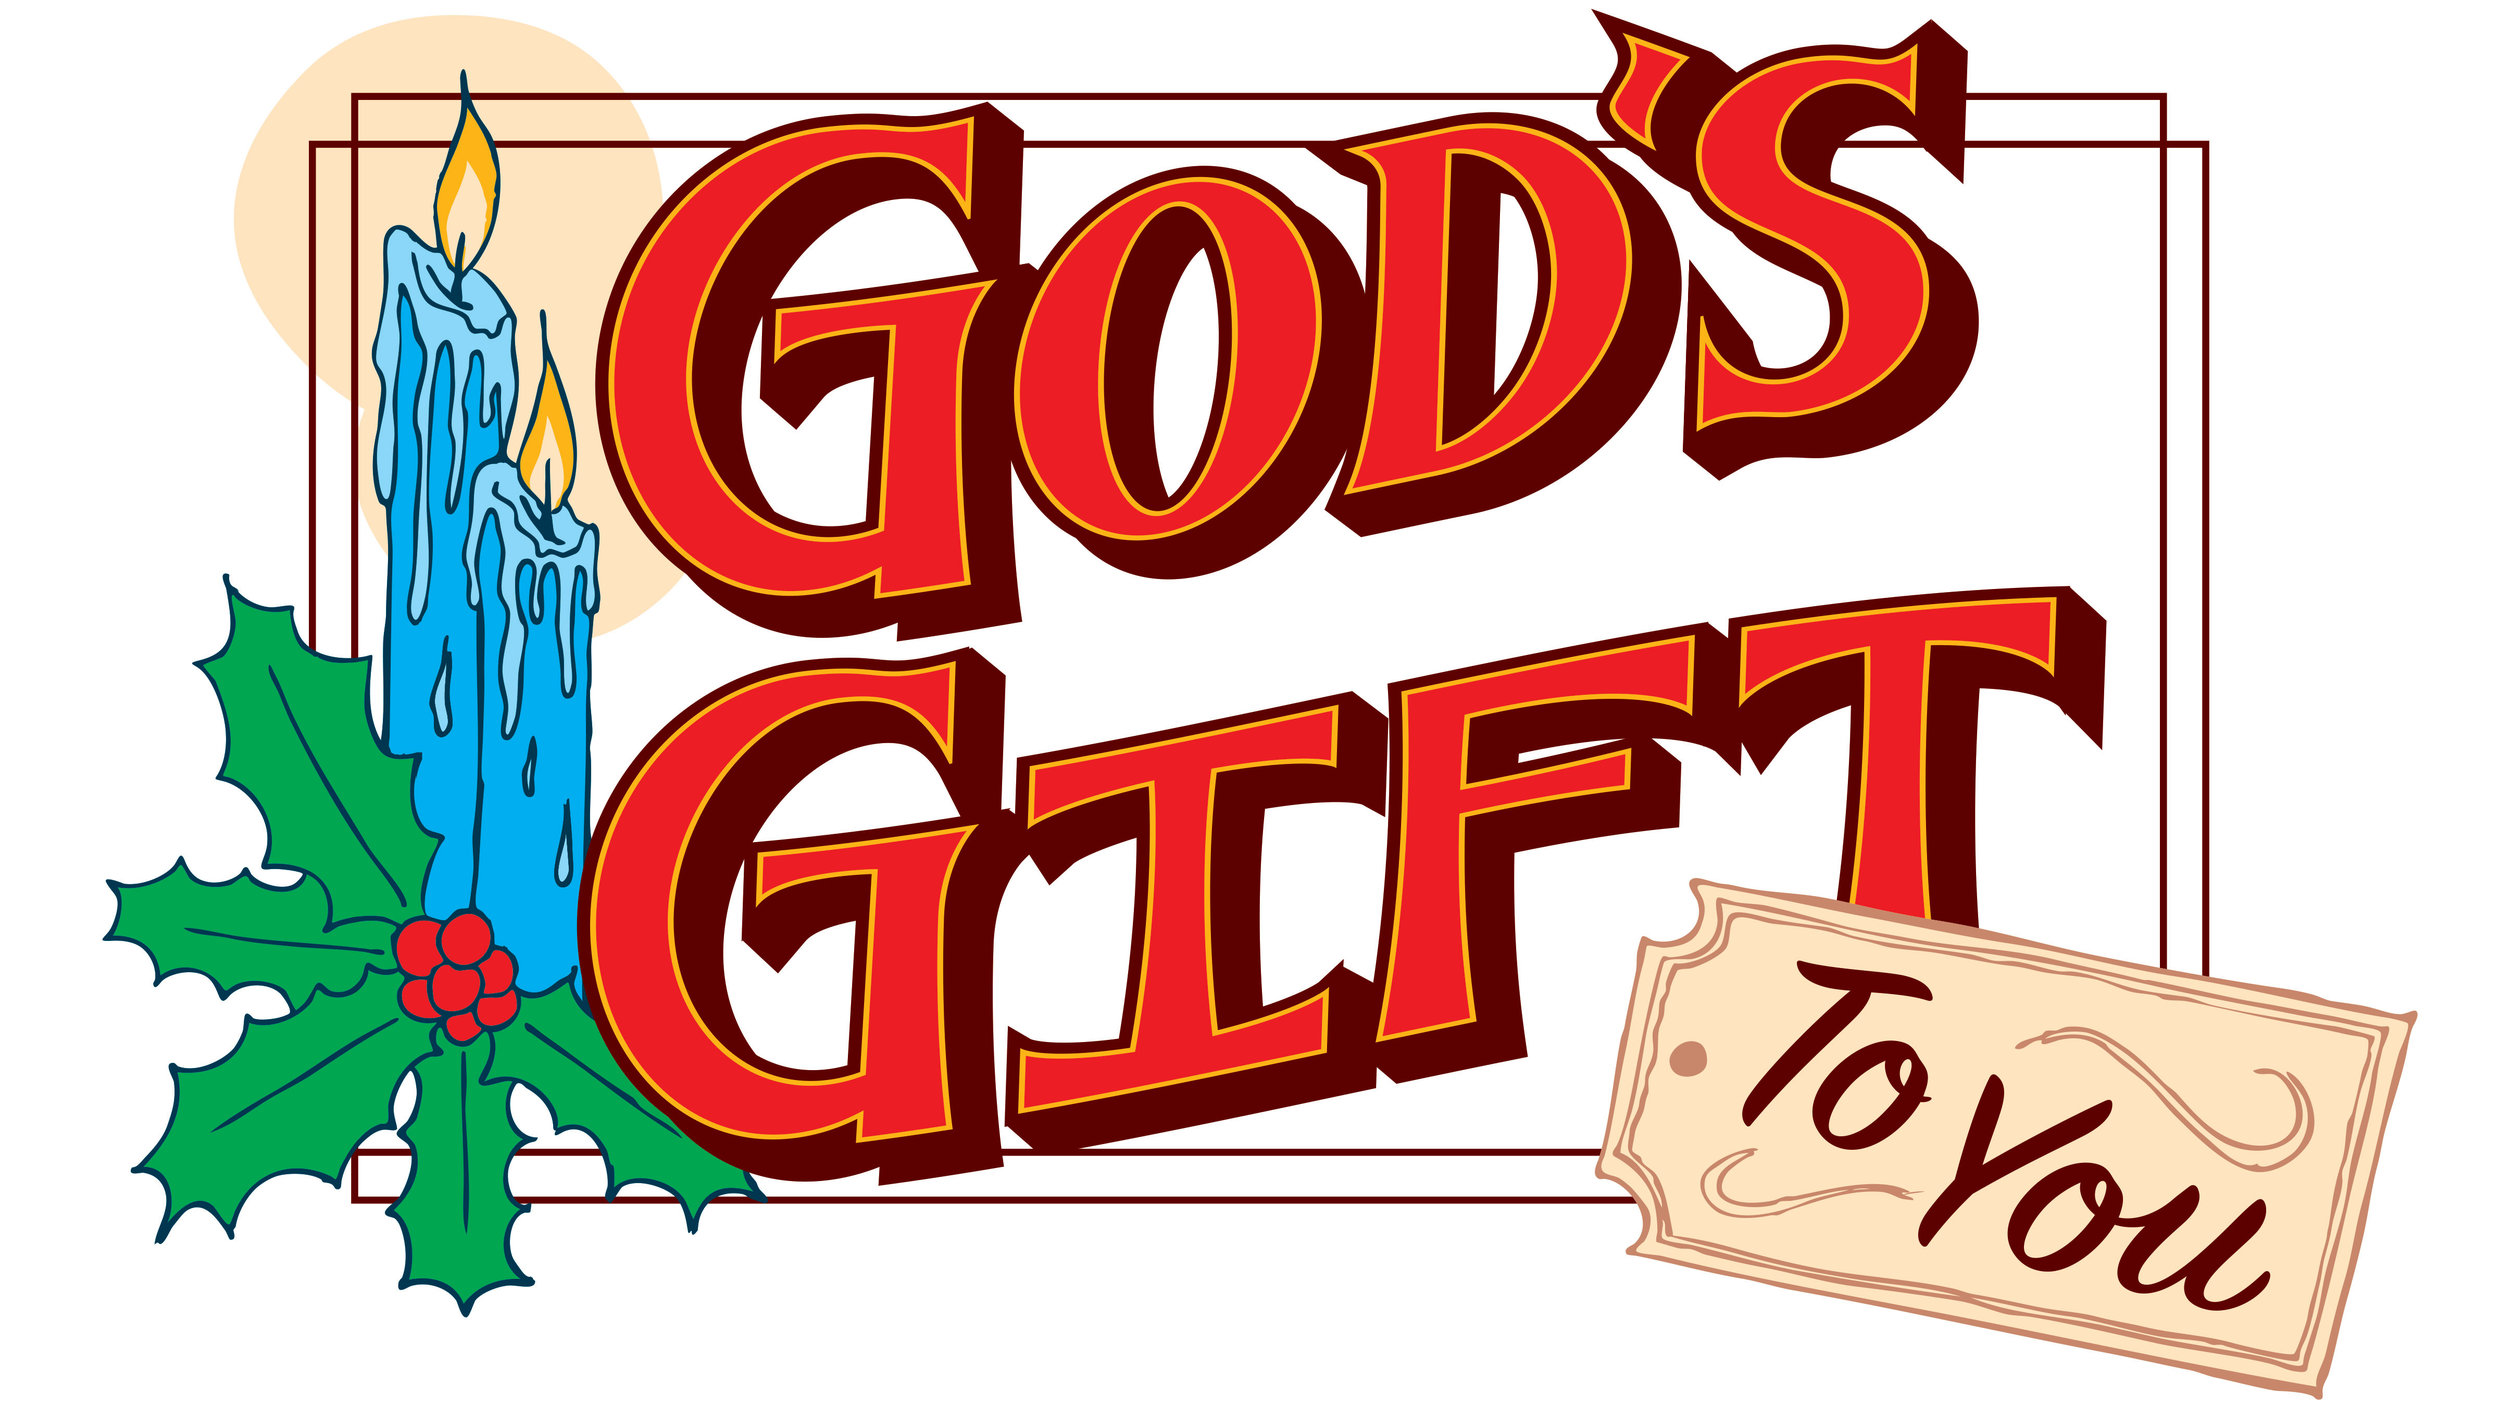 Gods-Gift-to-You.jpg